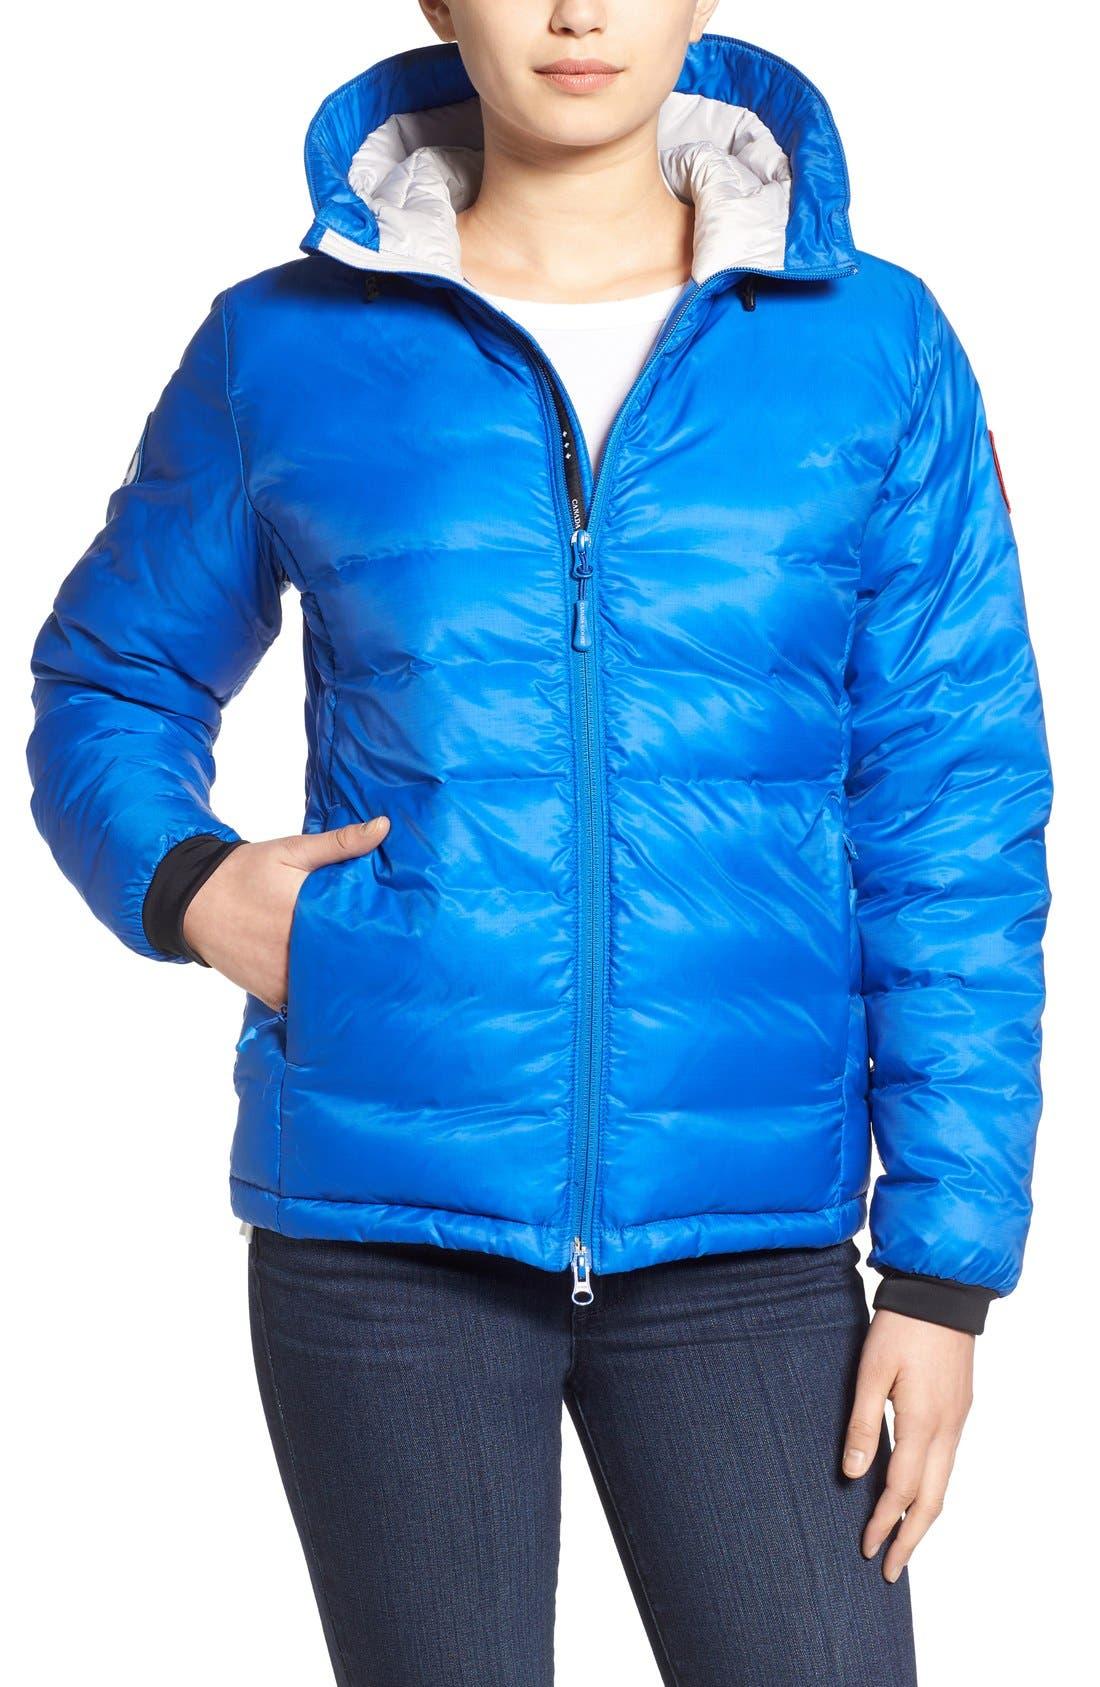 'PBI Camp' Packable Hooded Down Jacket,                             Main thumbnail 1, color,                             ROYAL PBI BLUE